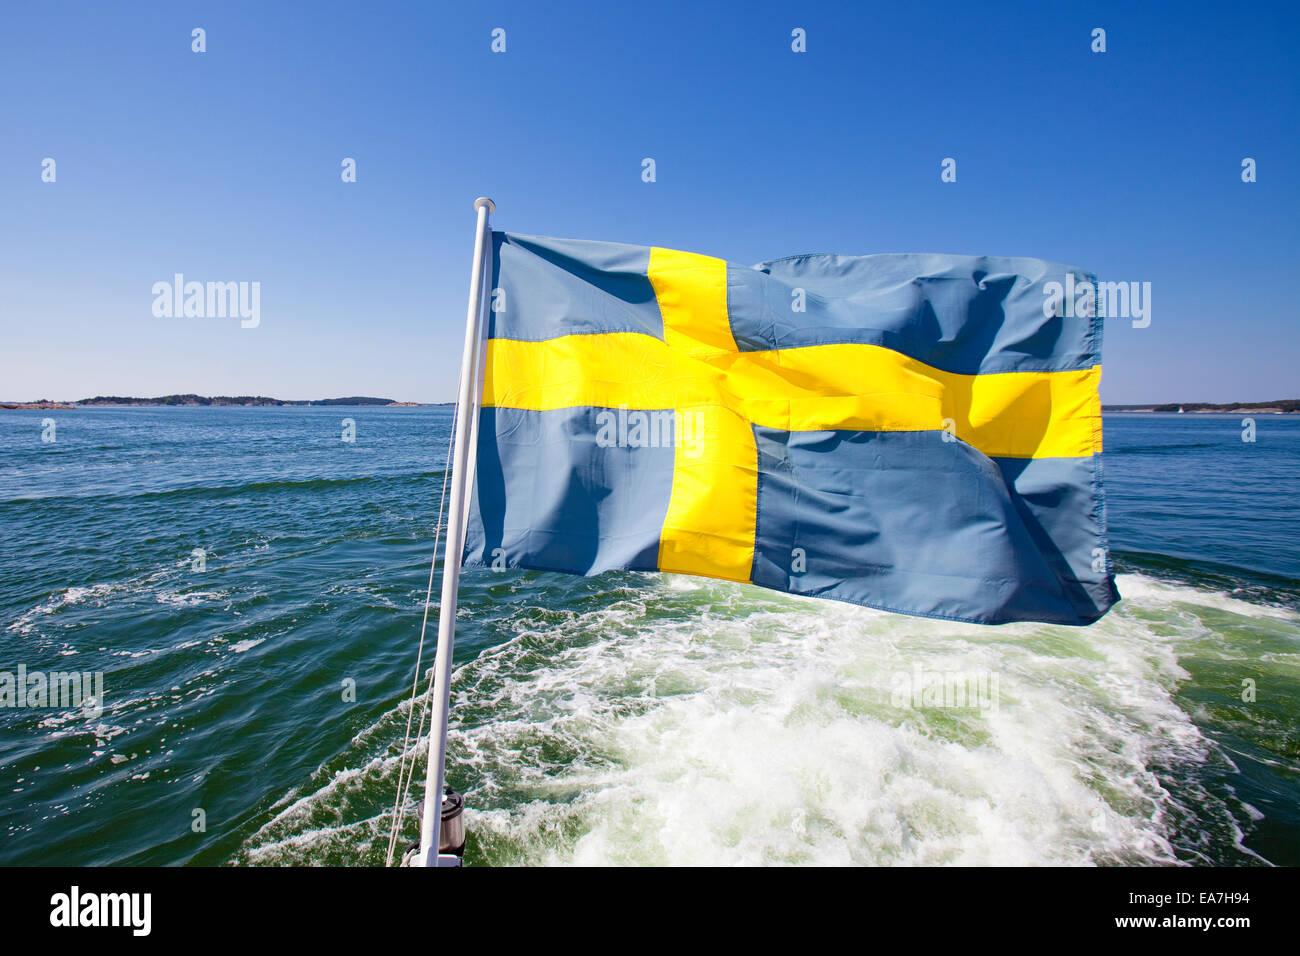 Sweden, Stockholm Archipelago - Swedish Flag on a Ferry - Stock Image